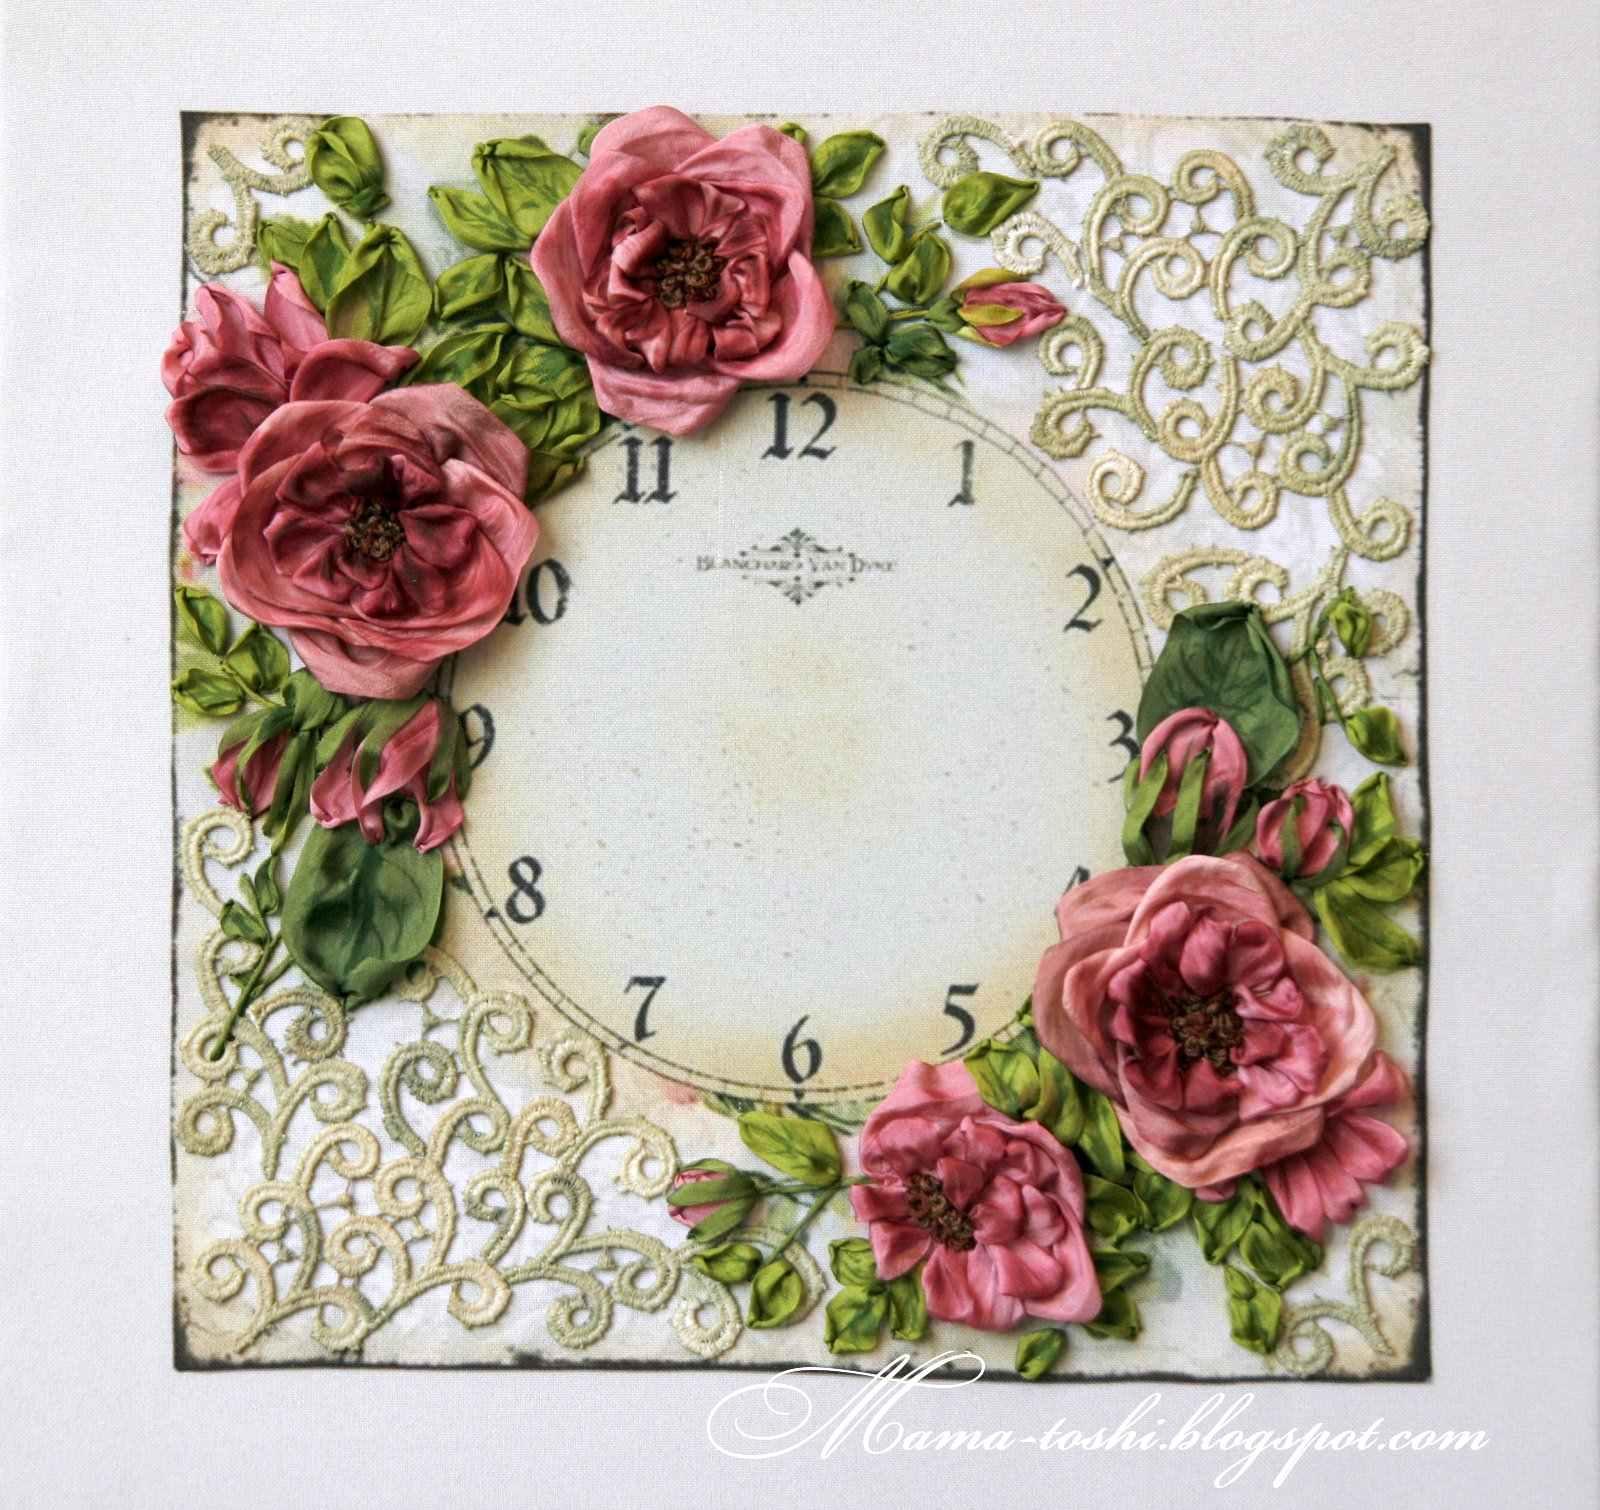 Вышивка в часах розы